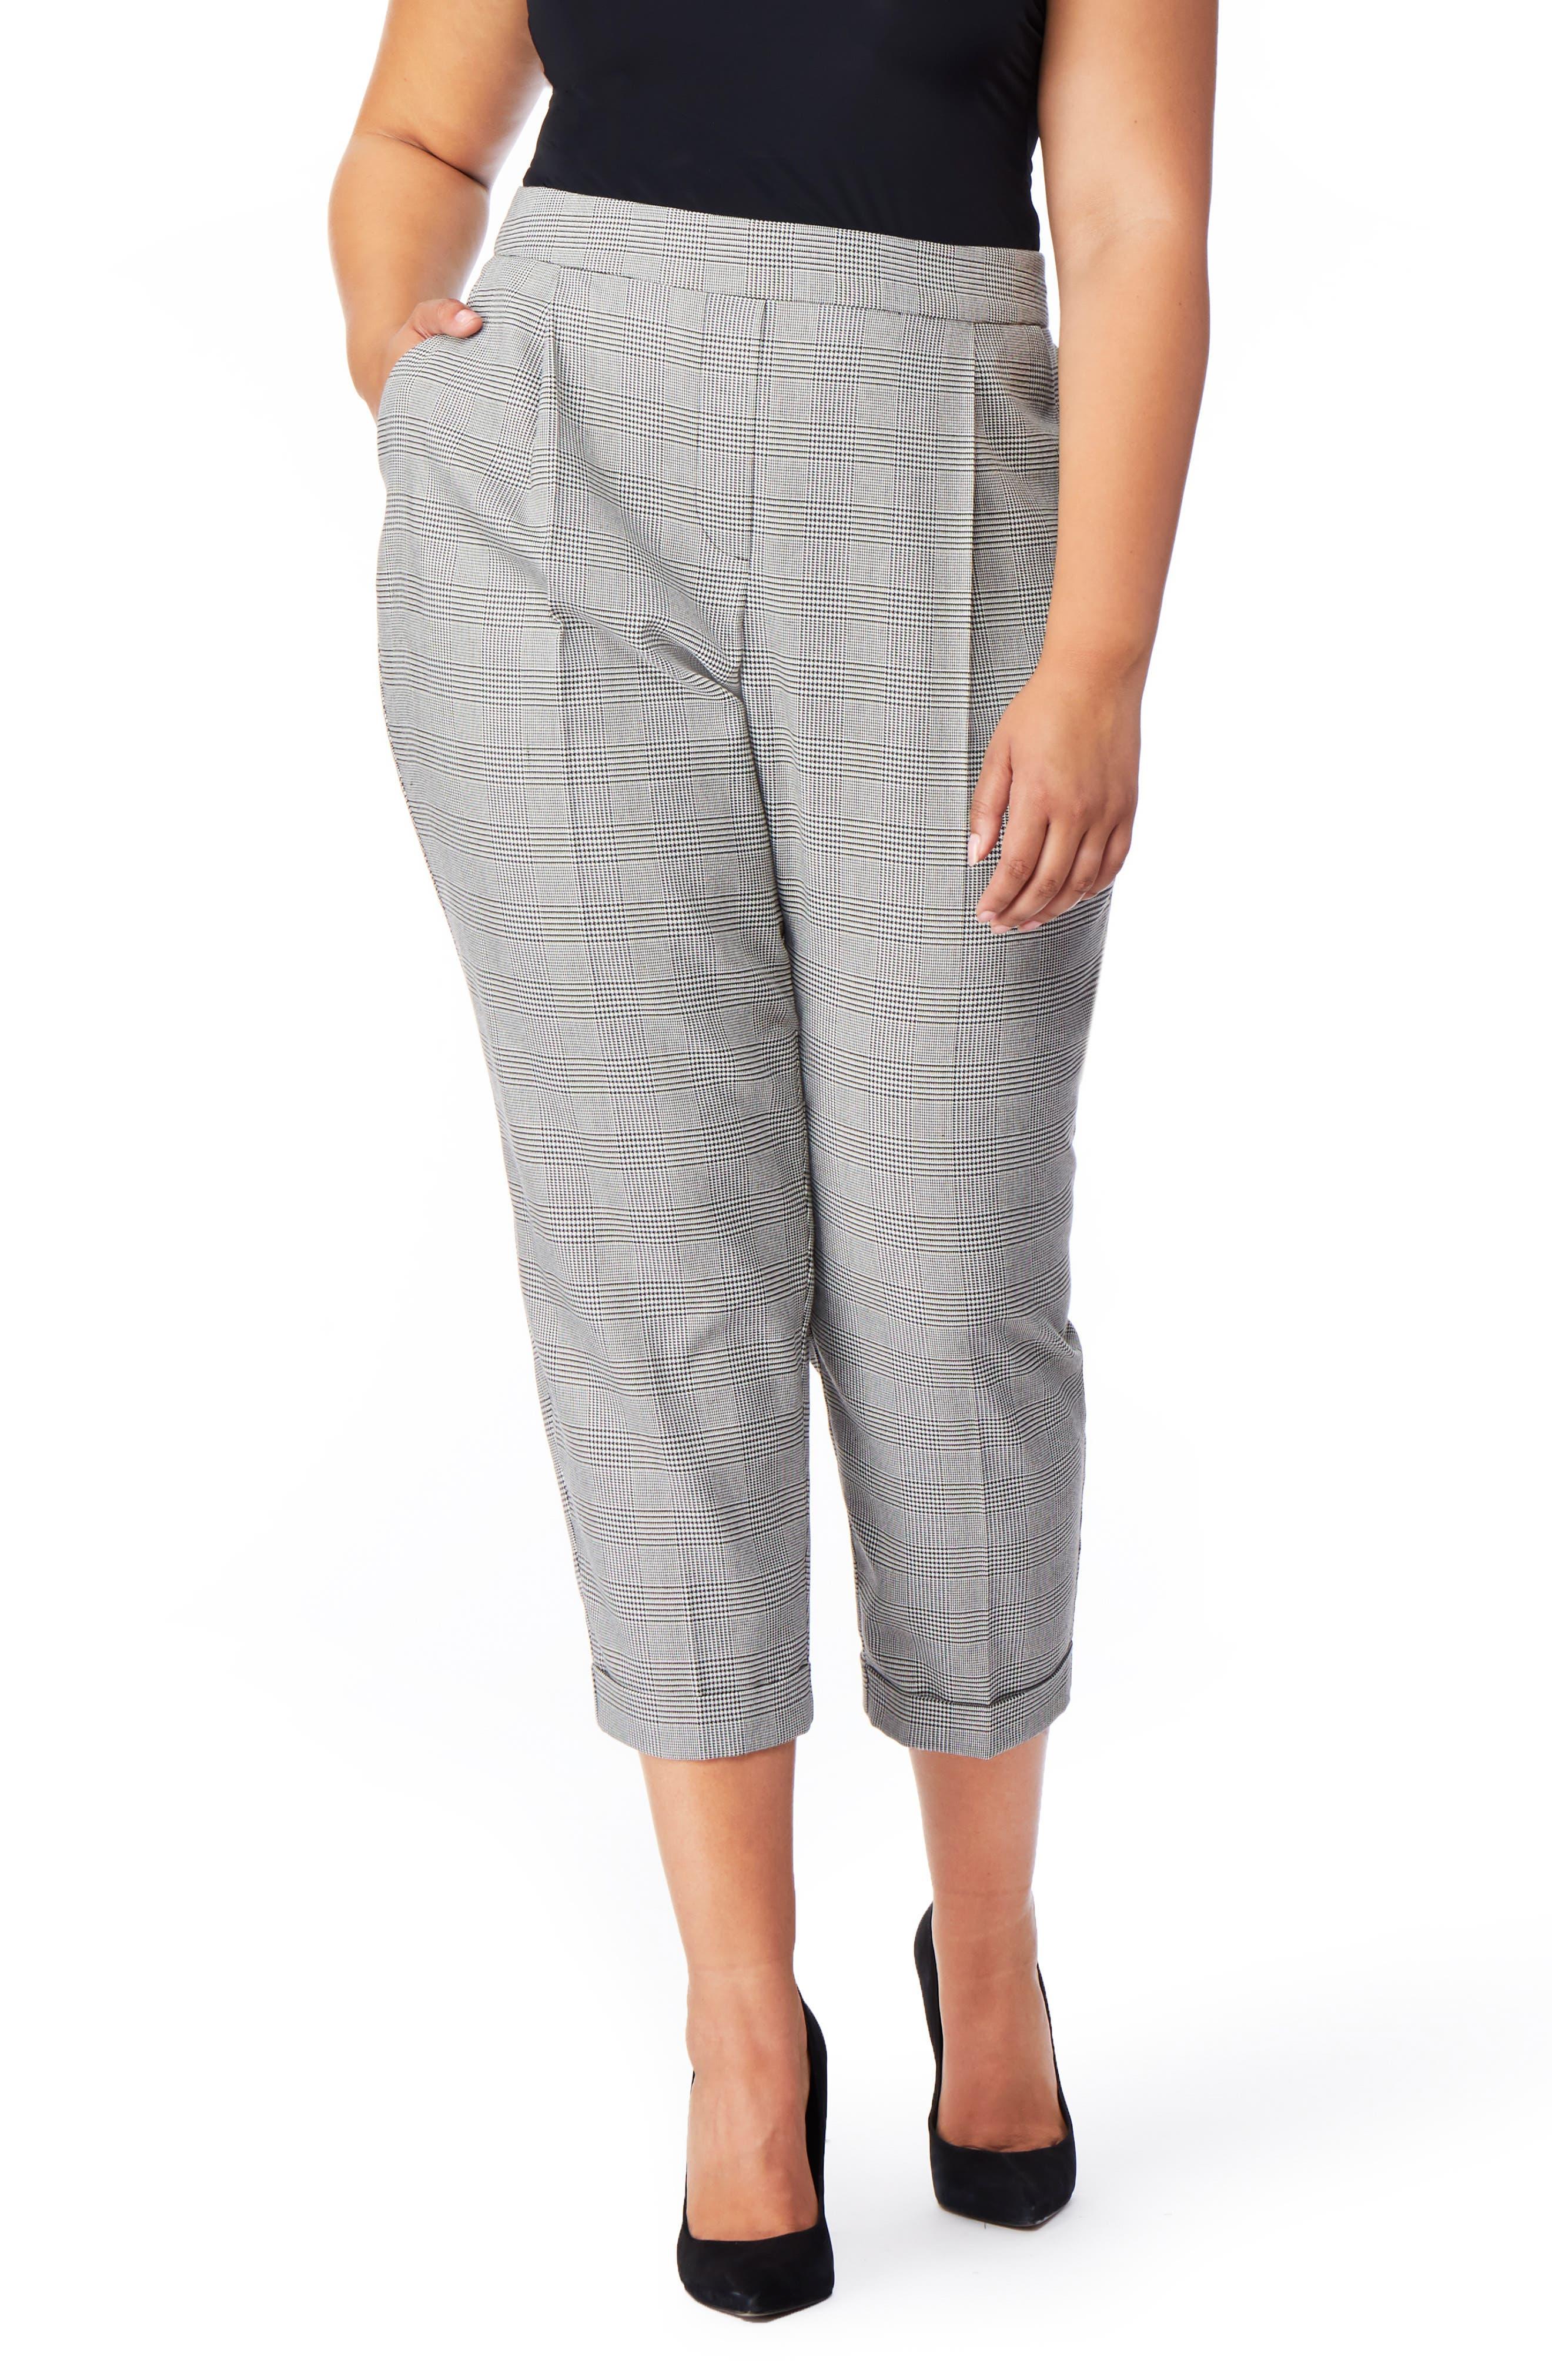 High Rise Cuffed Tuxedo Pants,                             Main thumbnail 1, color,                             SMALL PARTON PLAID